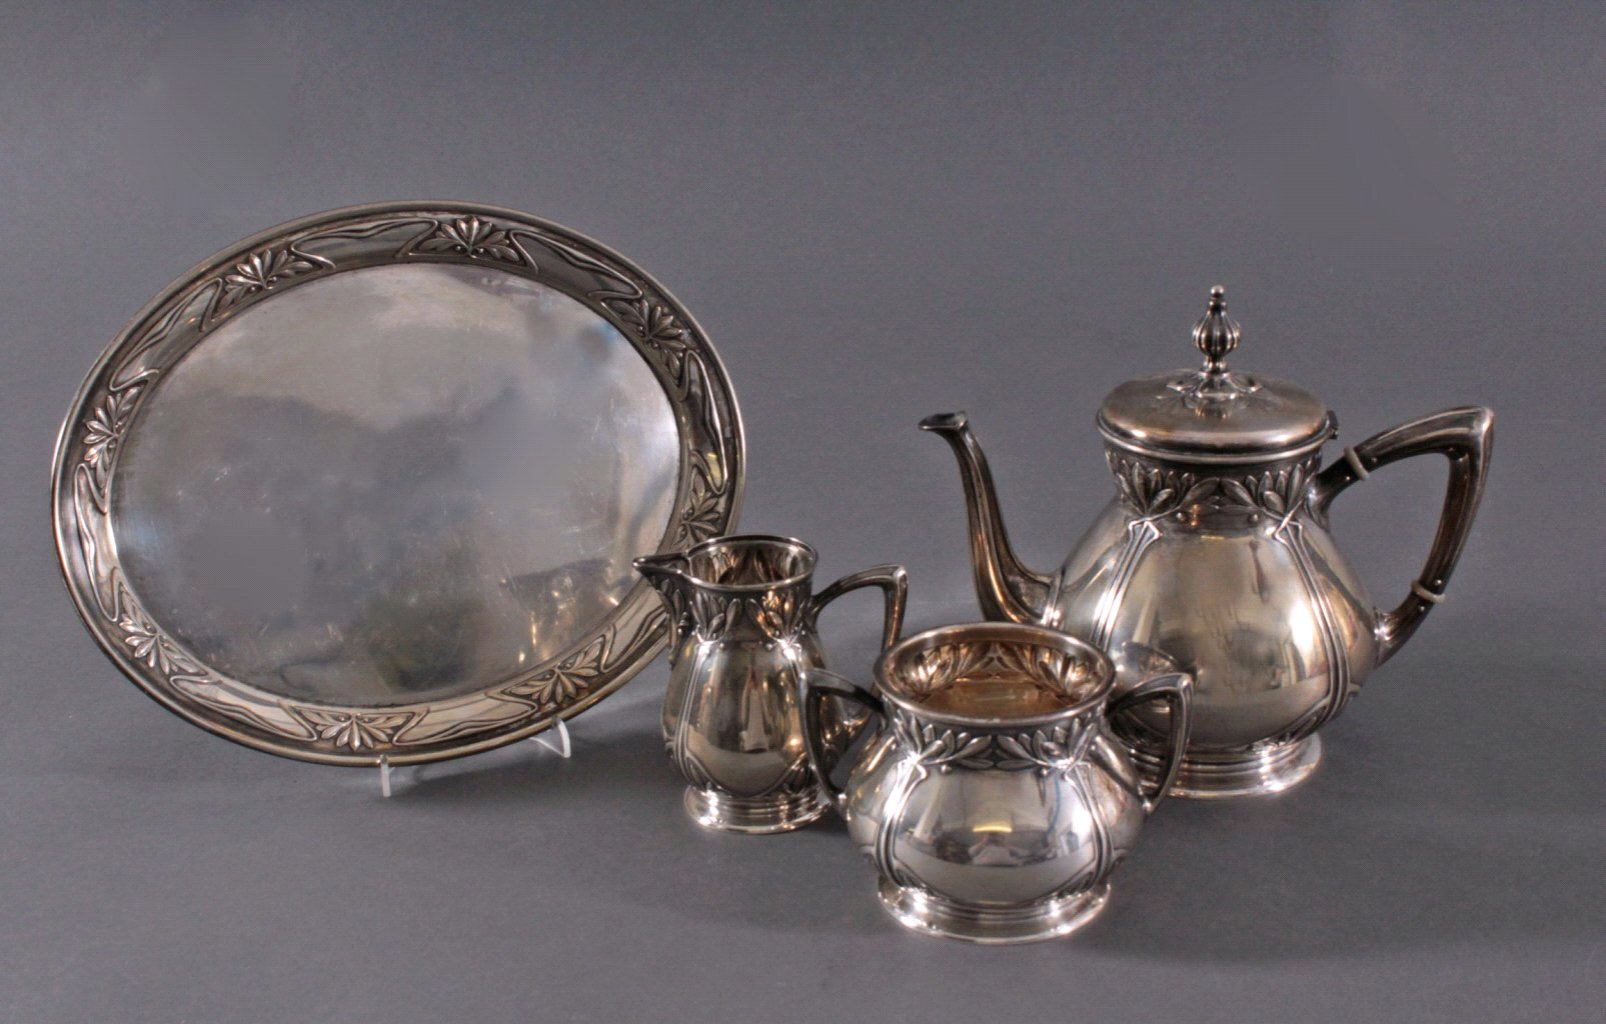 Silberner Kaffeekern auf Tablett, Jugendstil